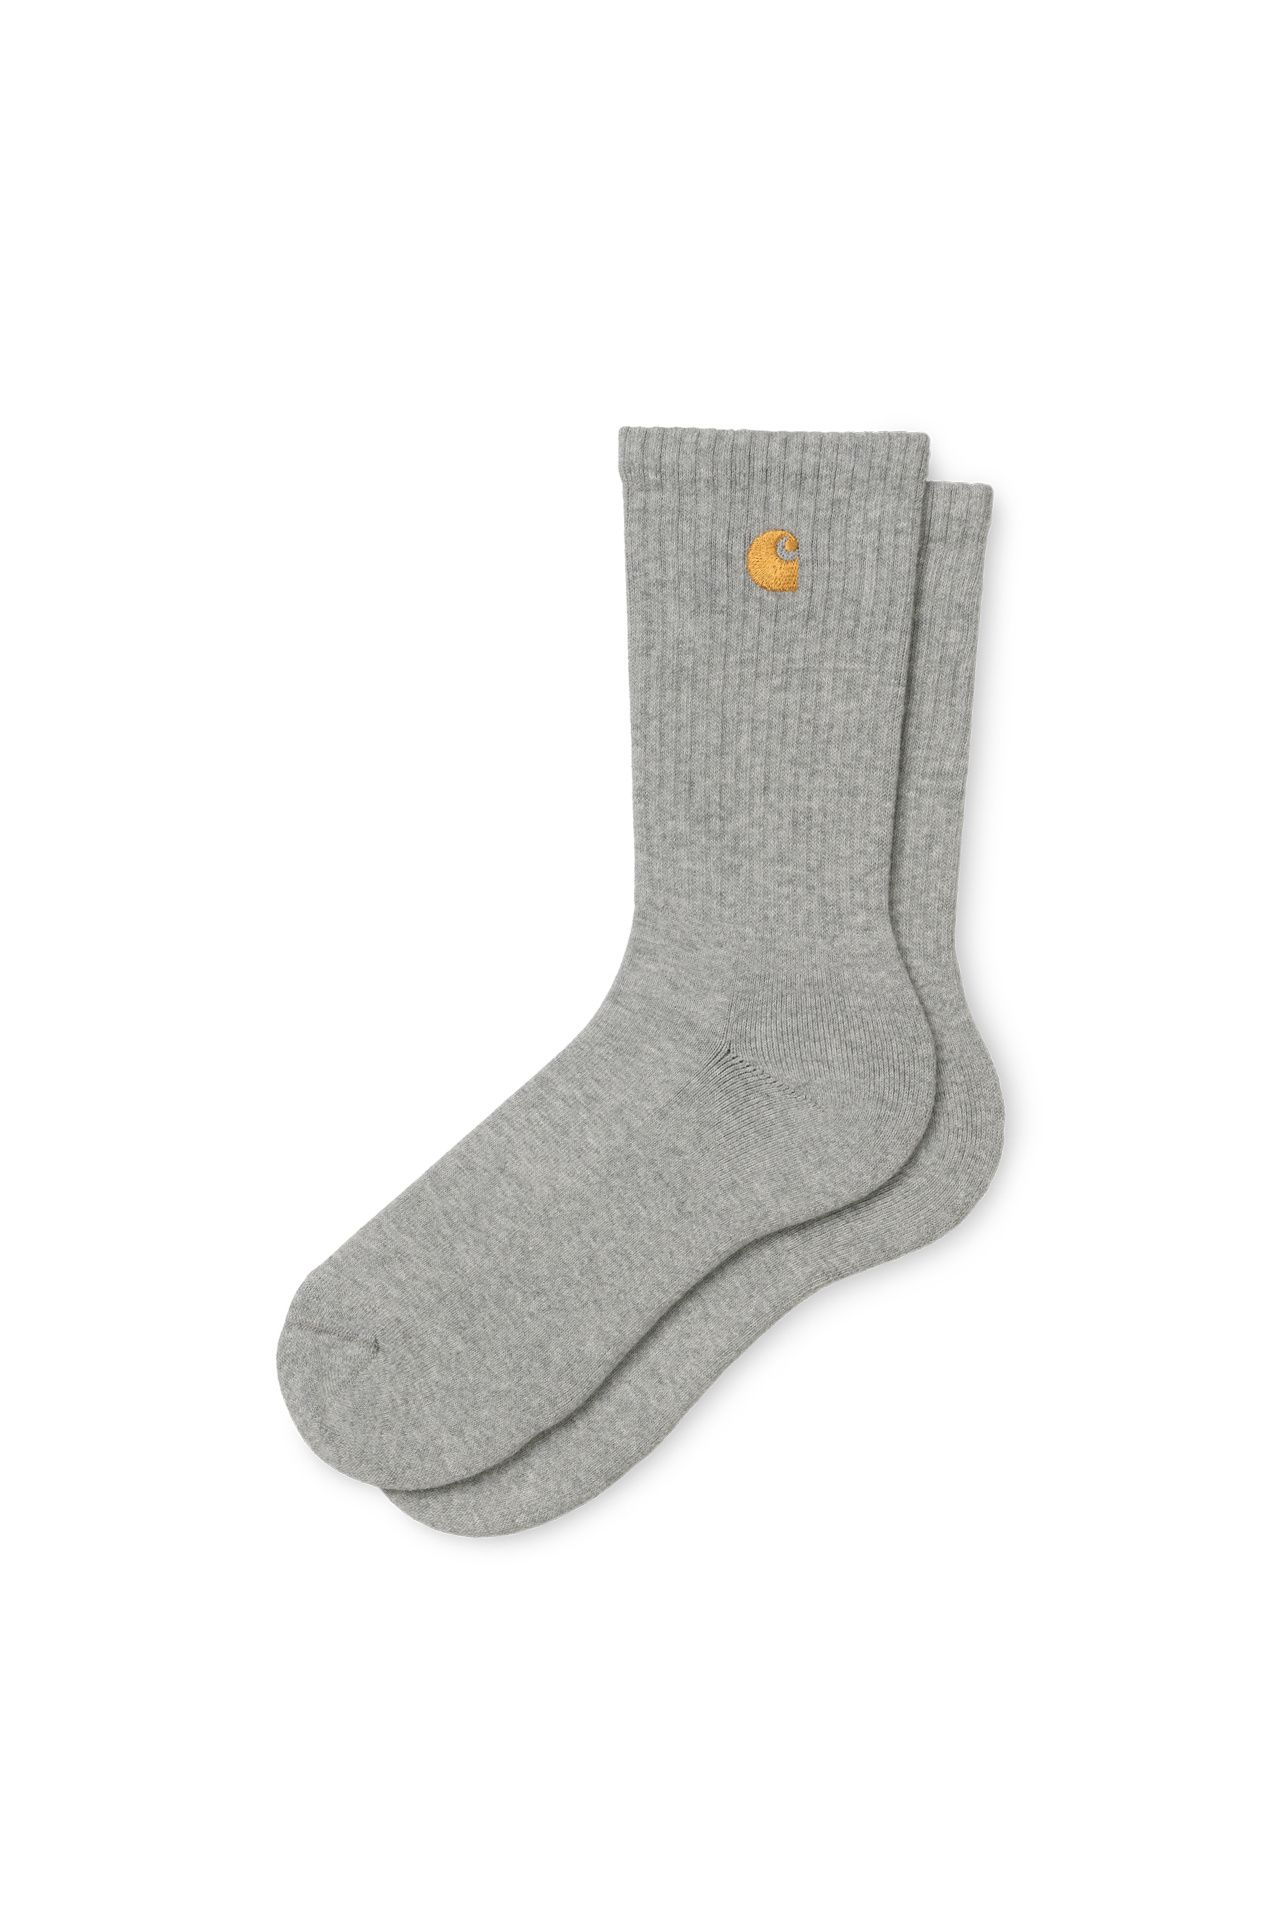 Afbeelding van Carhartt Sokken Chase Socks Grey Heather / Gold I026527